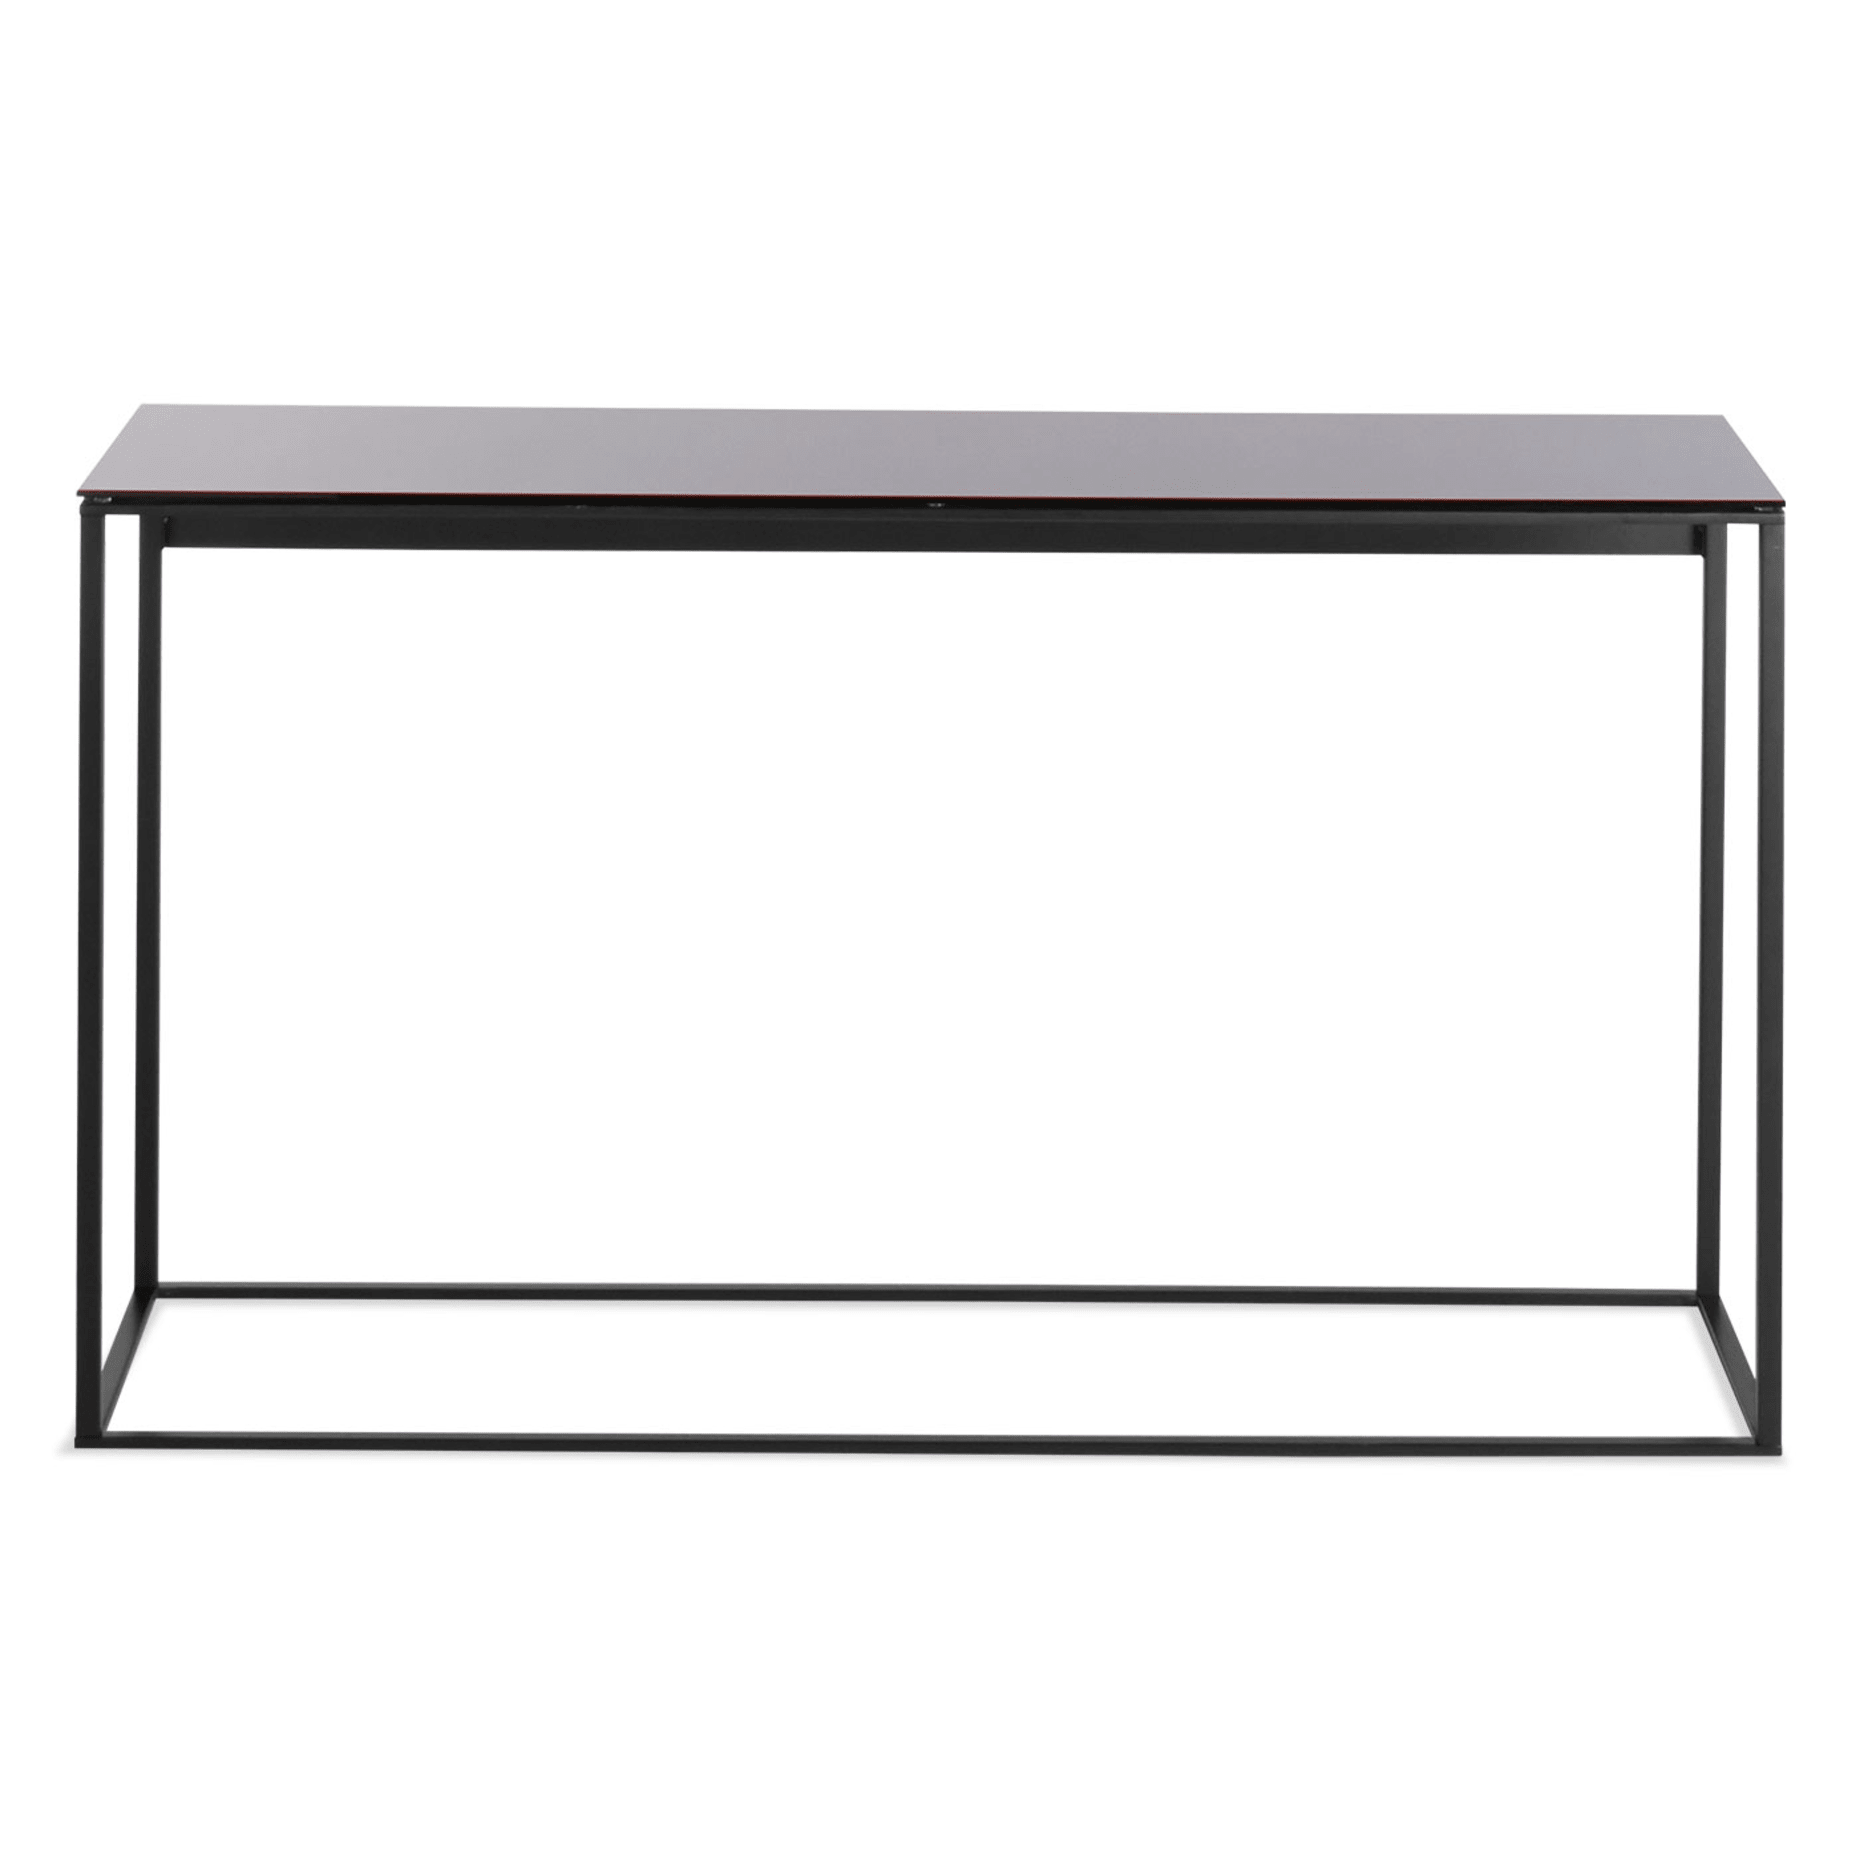 minimalista console table black black mirror front